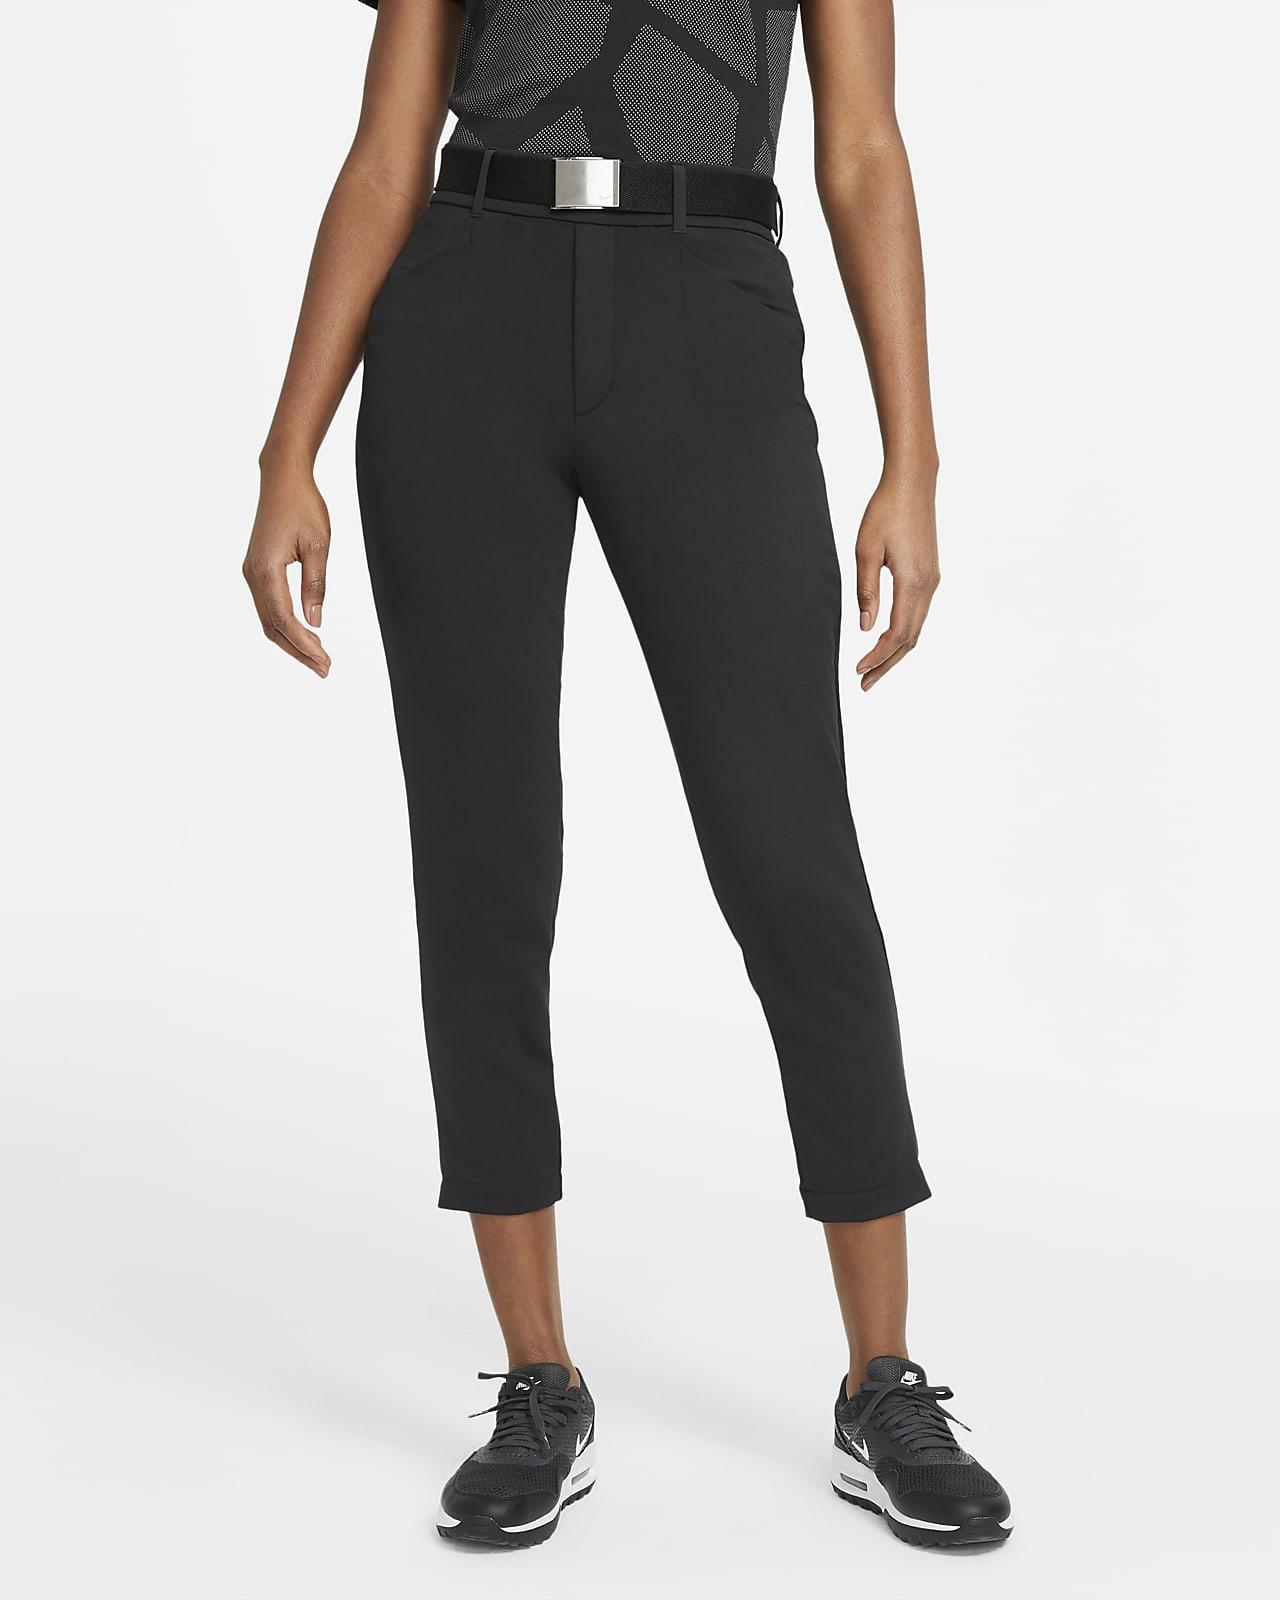 Nike Dri-FIT UV Ace Pantalón de golf de ajuste entallado - Mujer